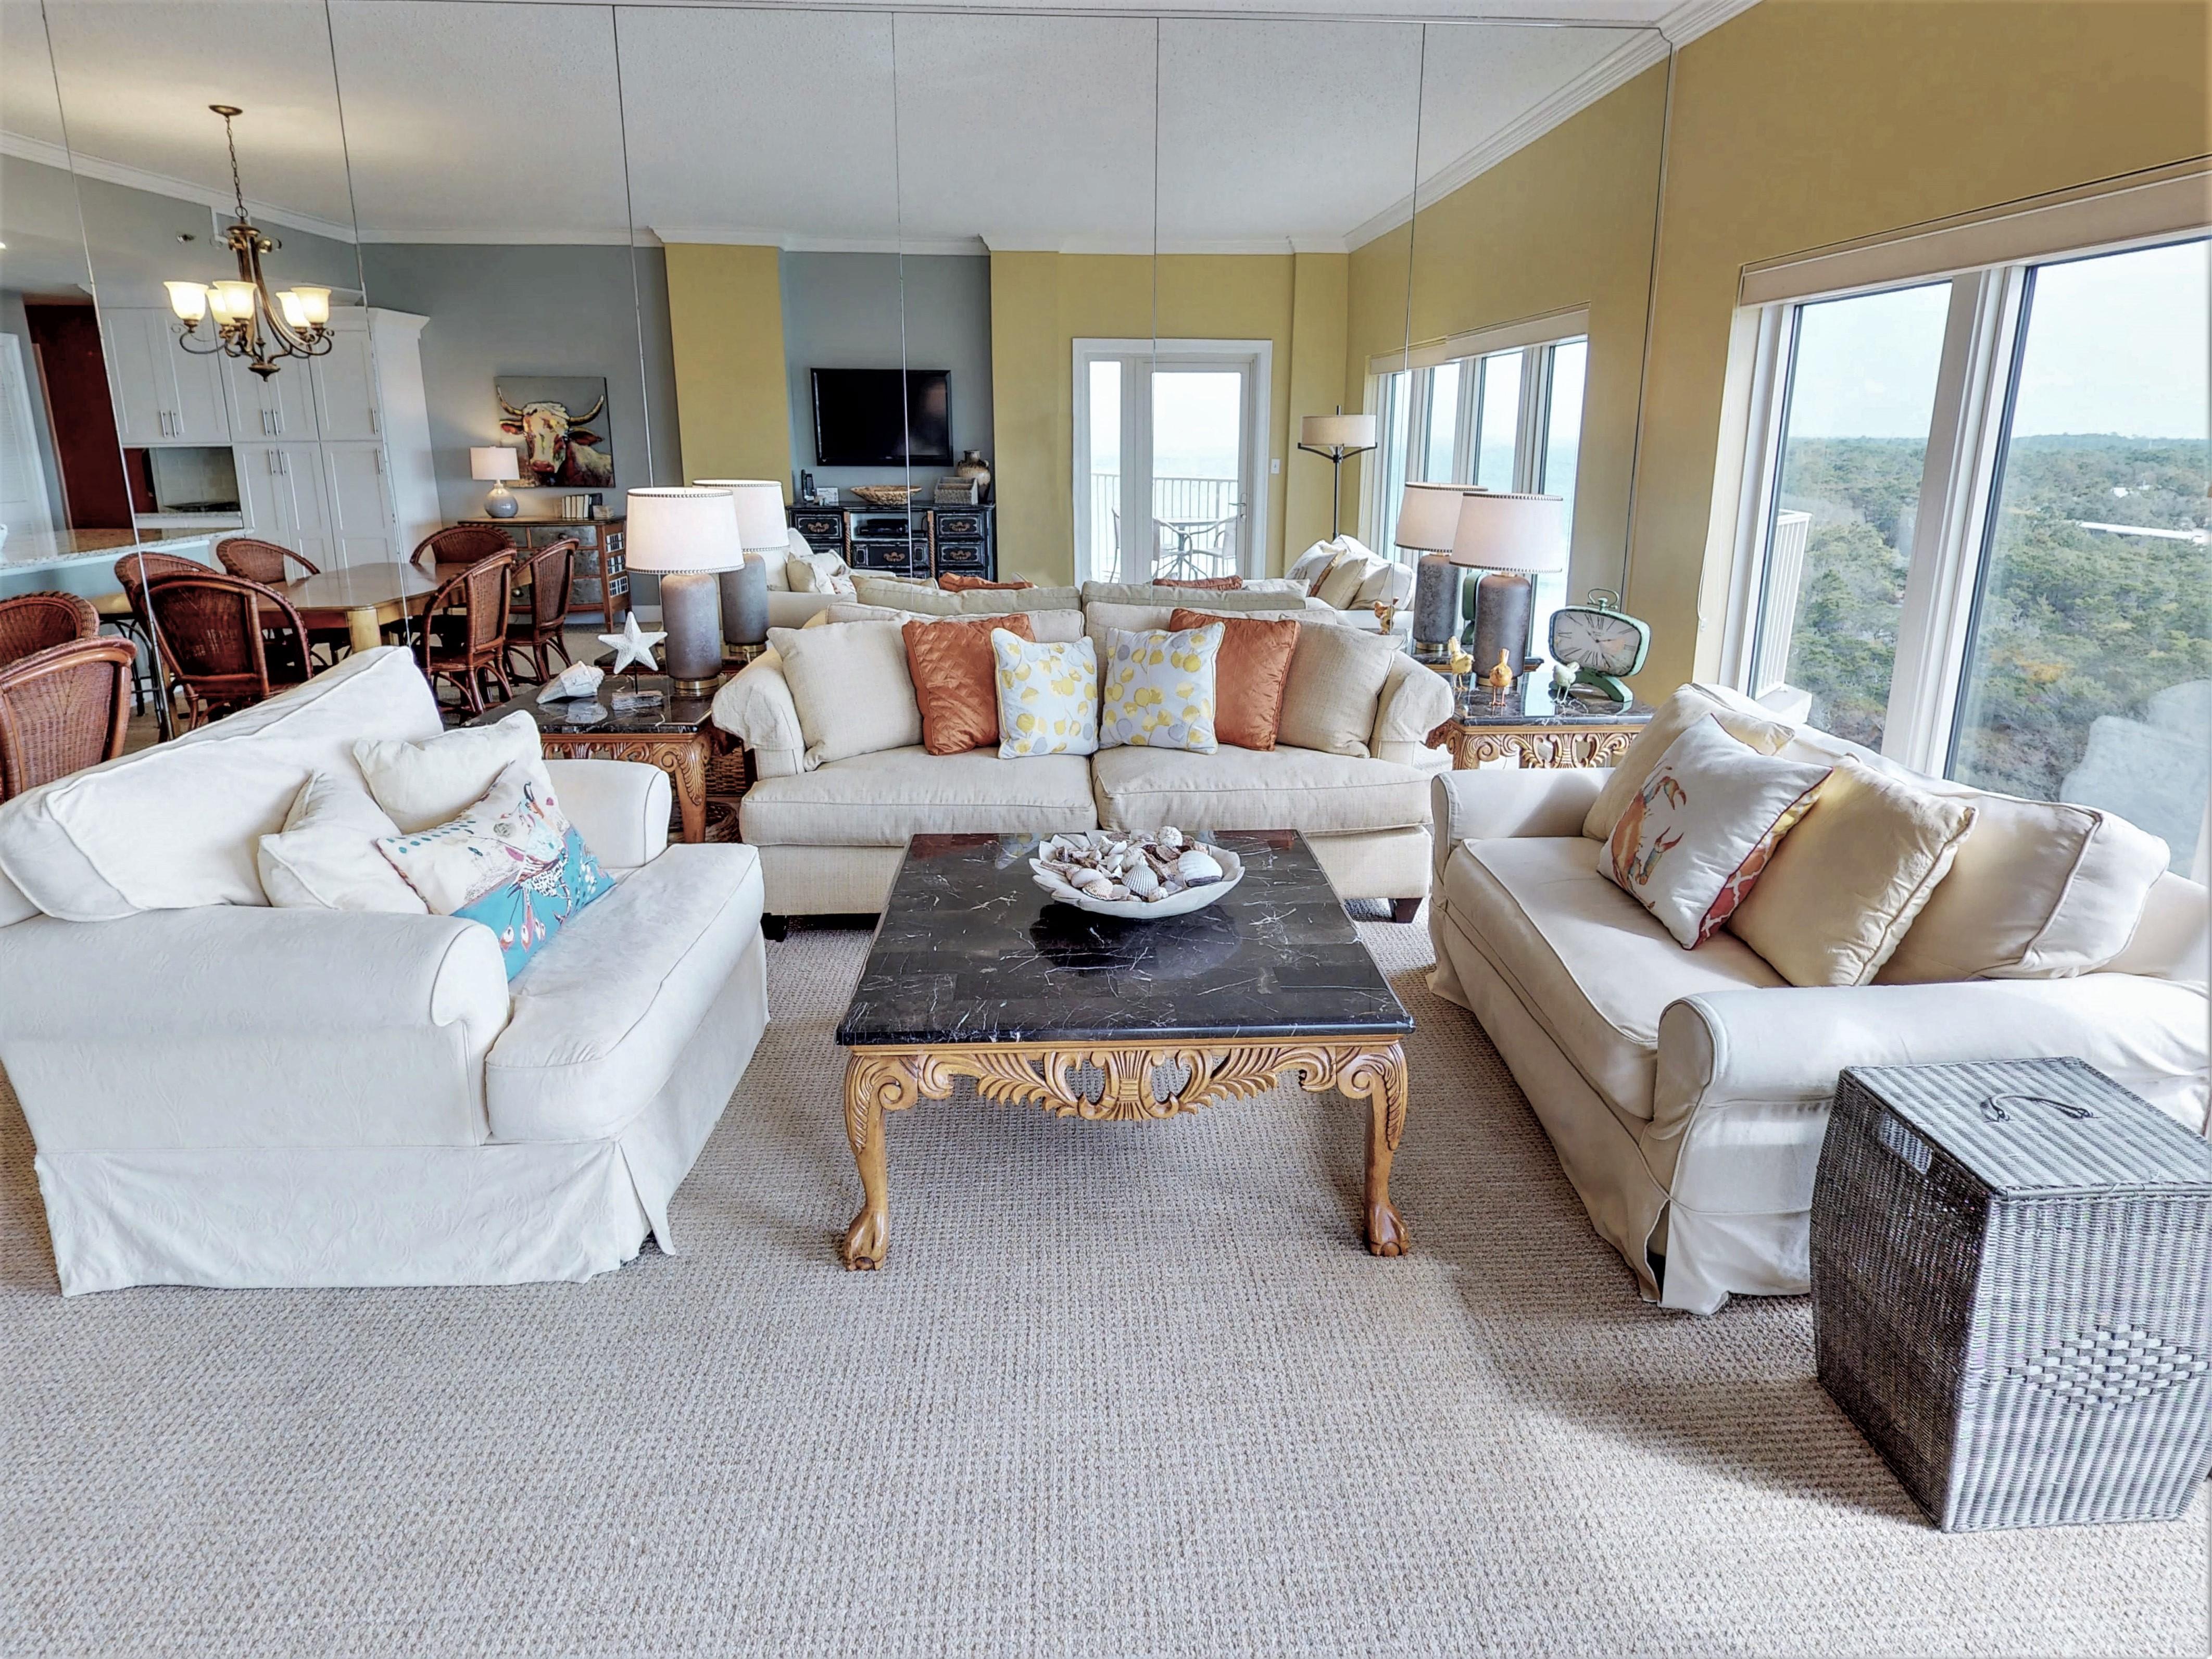 905 Tops'l Beach Manor Condo rental in TOPS'L Beach Manor  in Destin Florida - #3